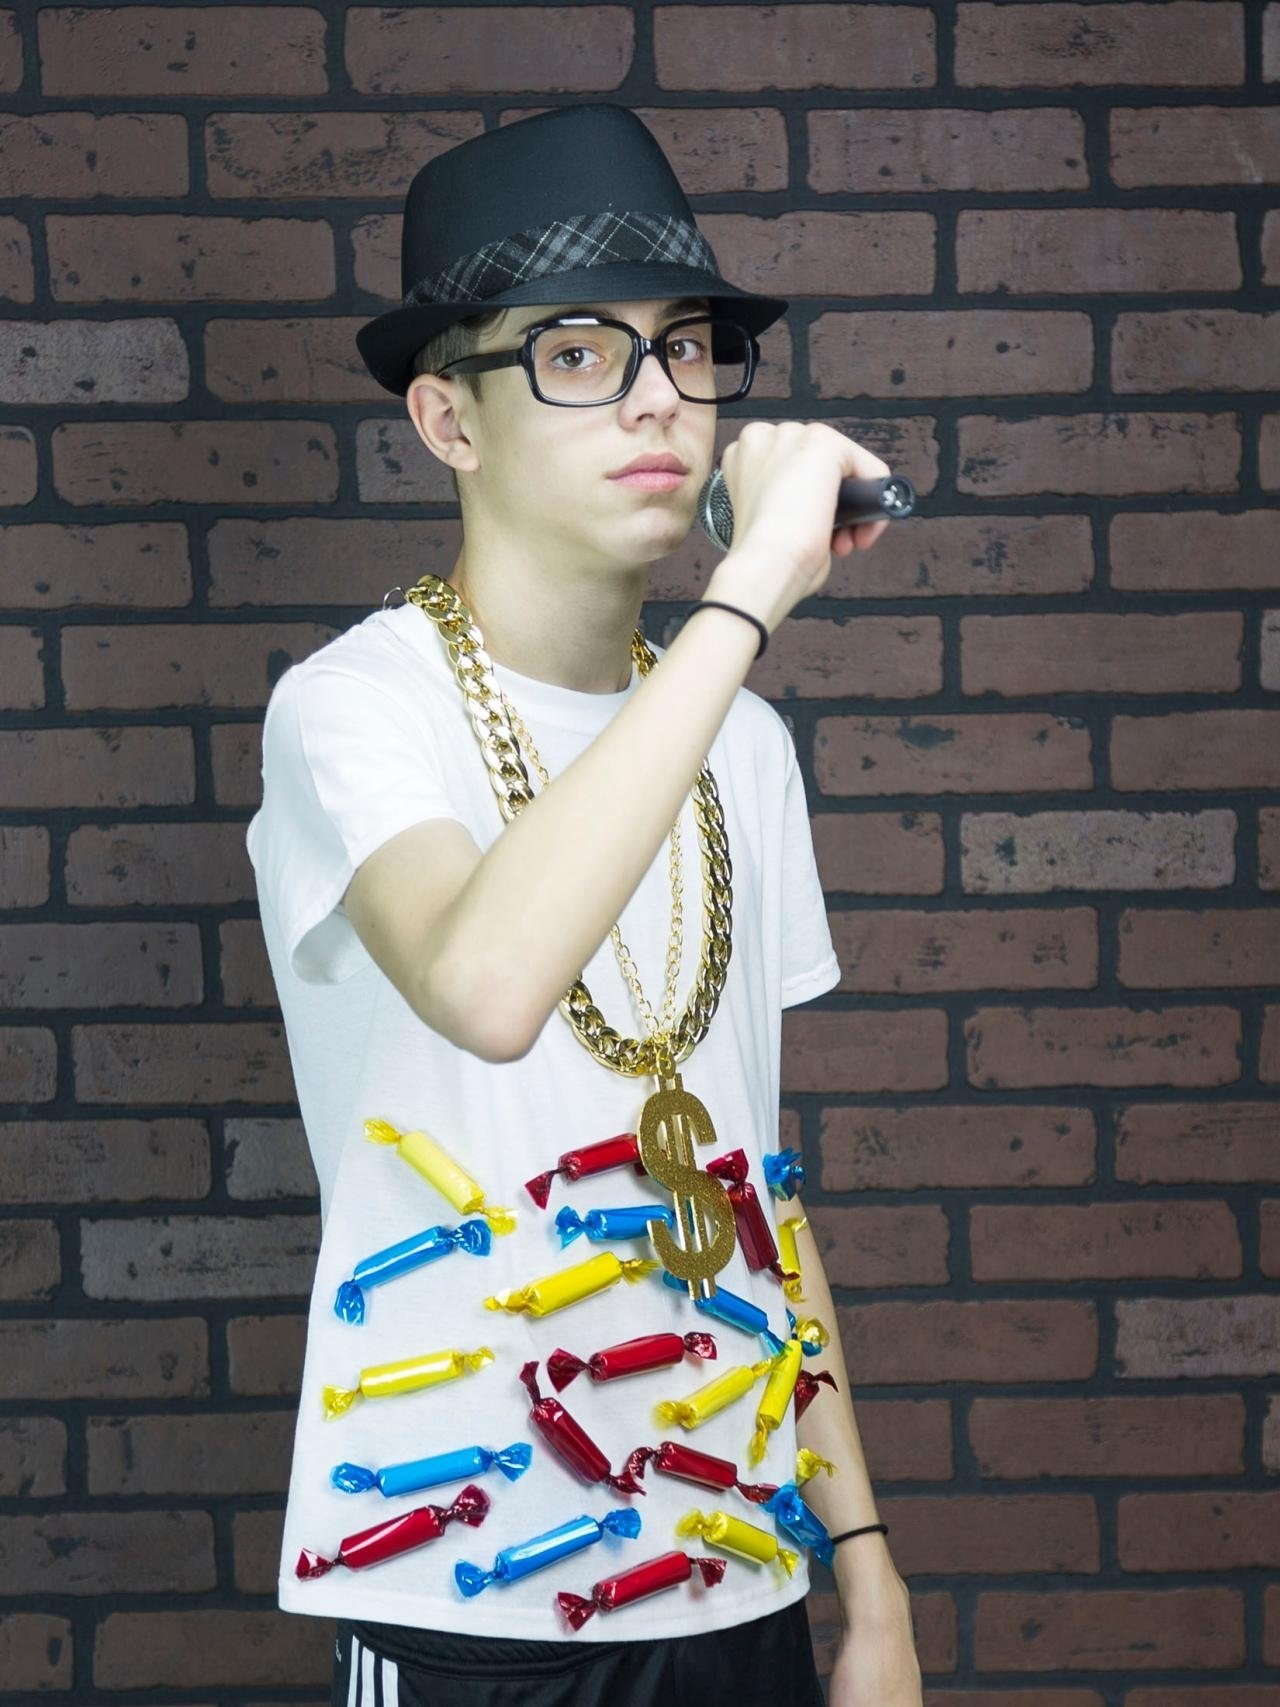 10 Lovable Boy Girl Halloween Costume Ideas easy budget halloween costume hip hop candy rapper easy budget 9 2021